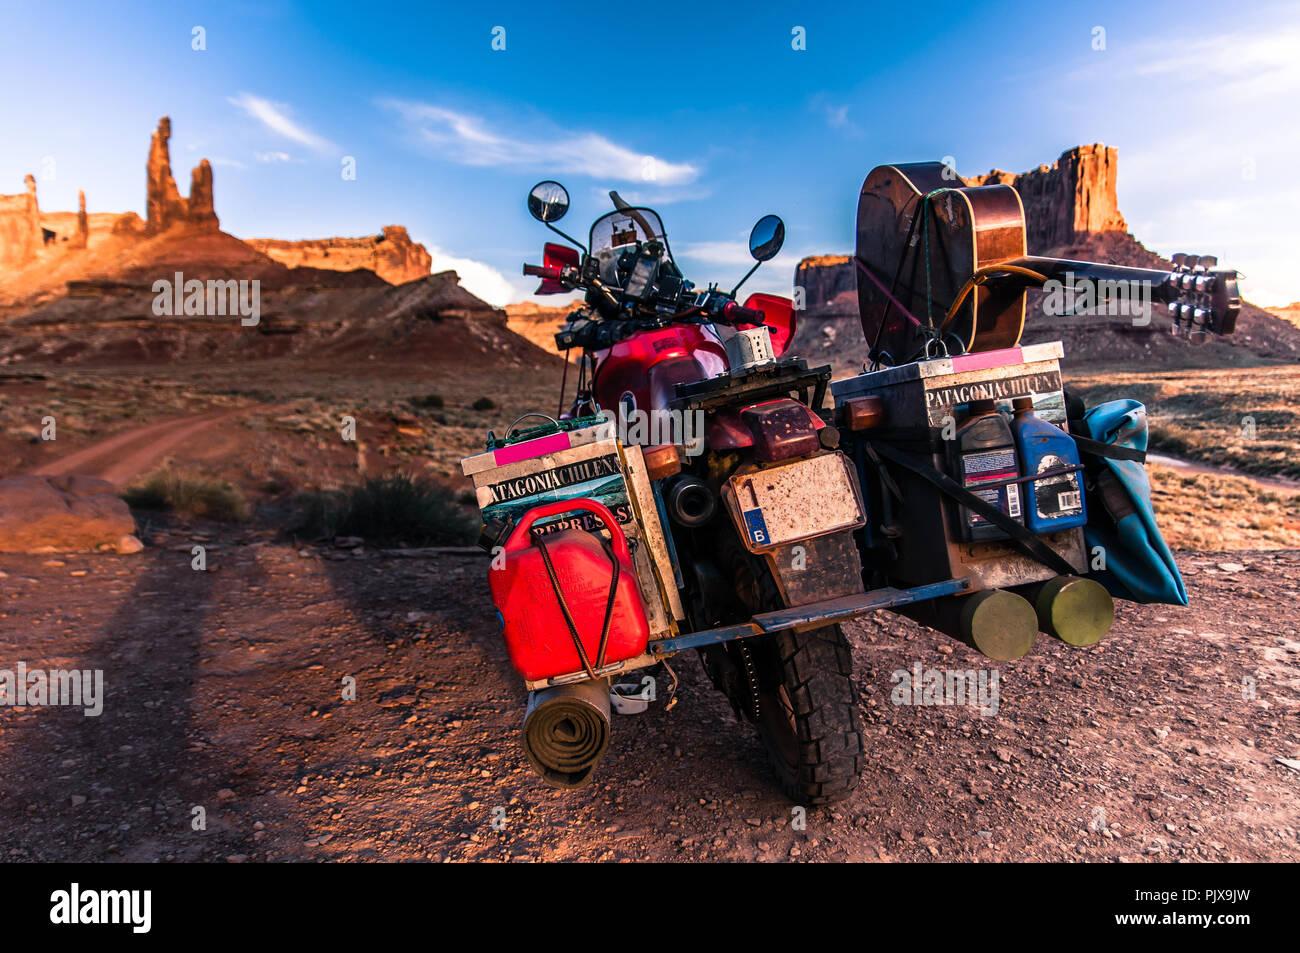 Motorrad auf Rock climbing Route, Canyonlands National Park, Moab, Utah, USA Stockfoto